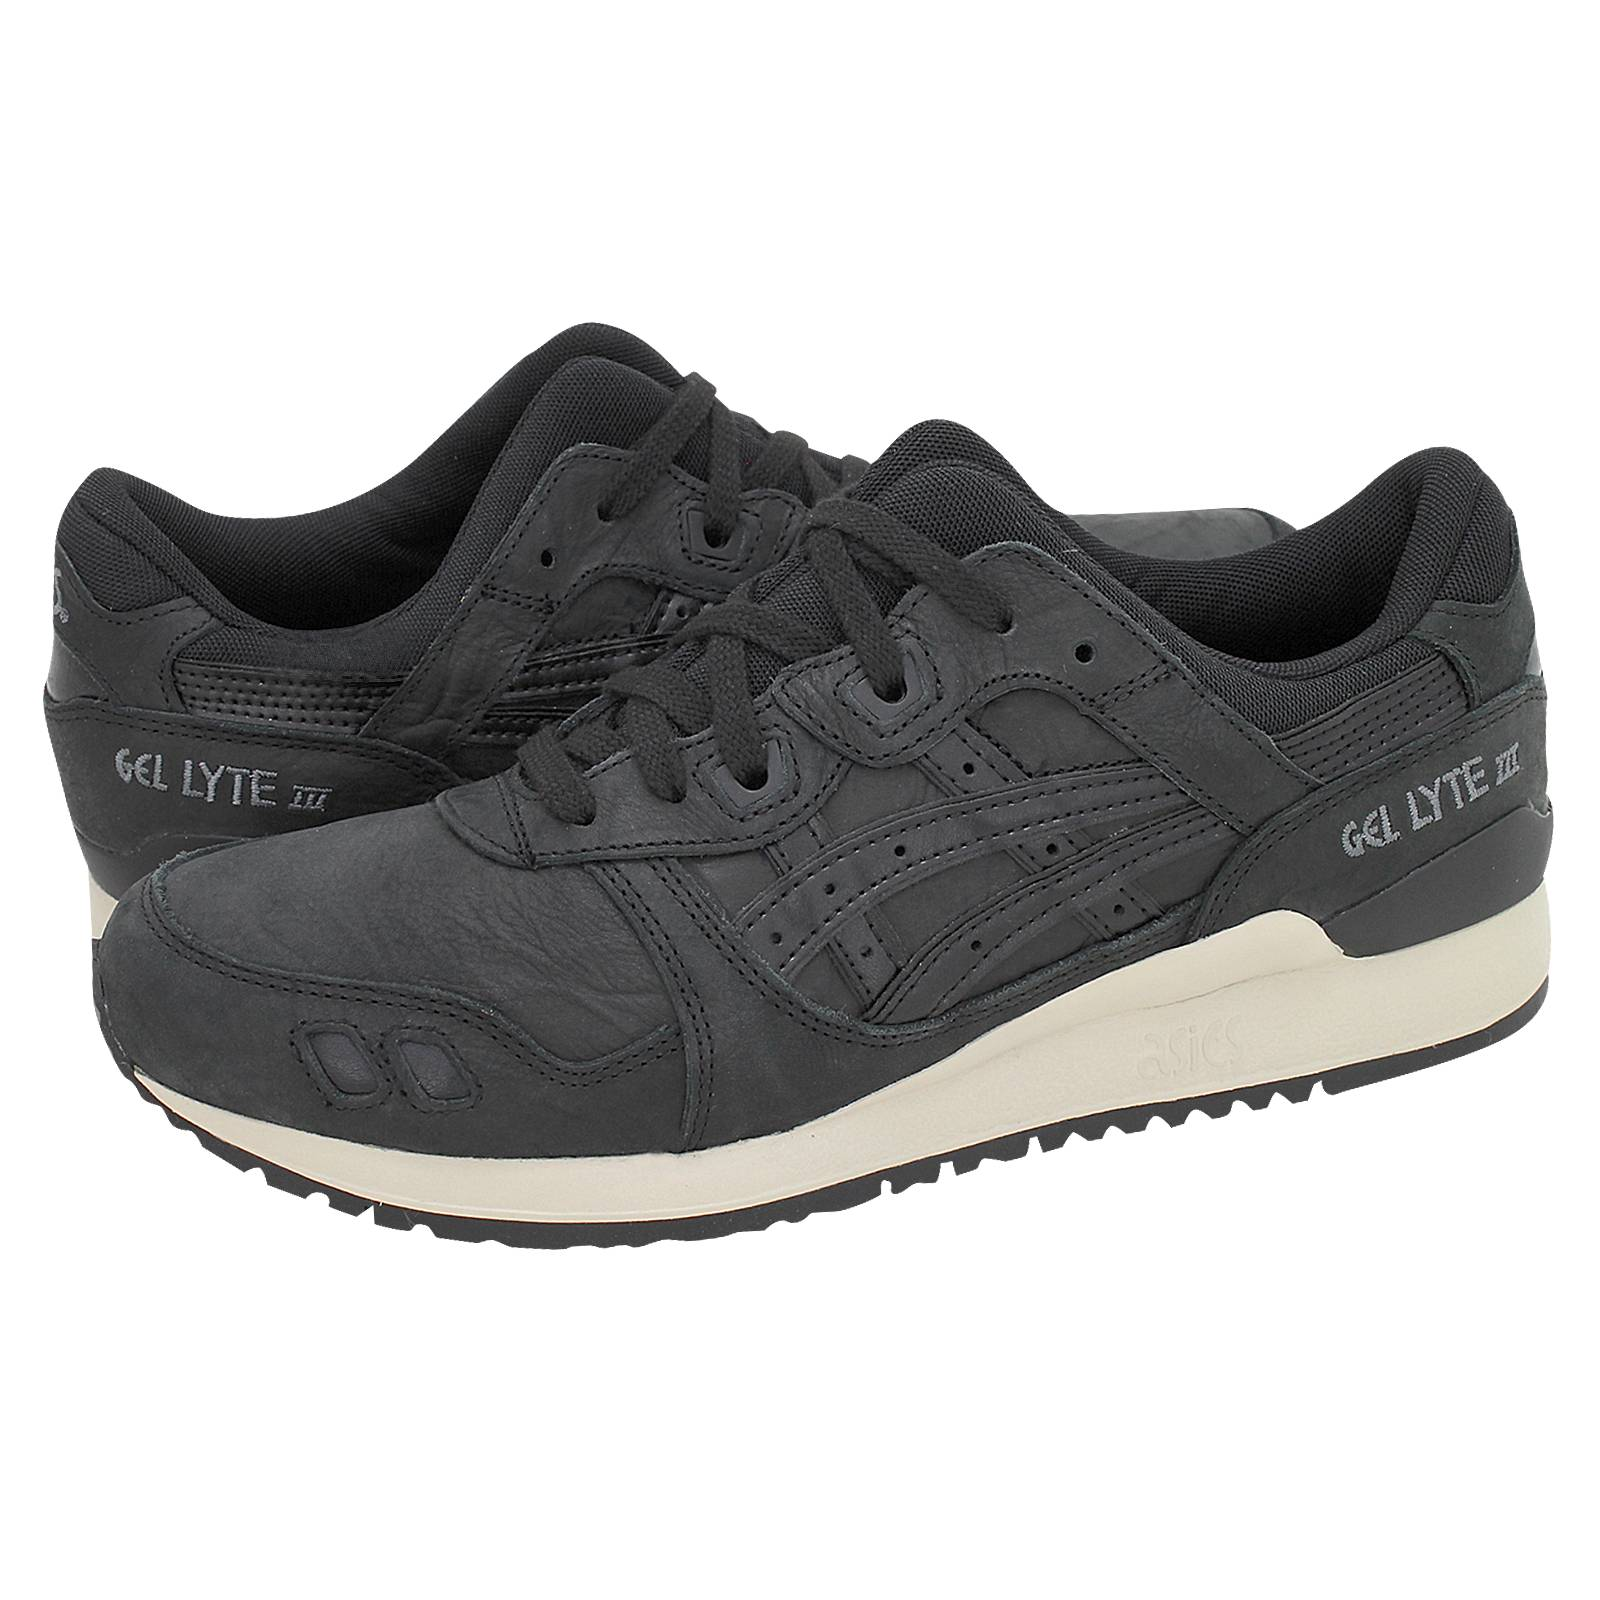 d0f29014107 Gel-Lyte III - Ανδρικά αθλητικά παπούτσια Asics από nubuck, δερμα ...: